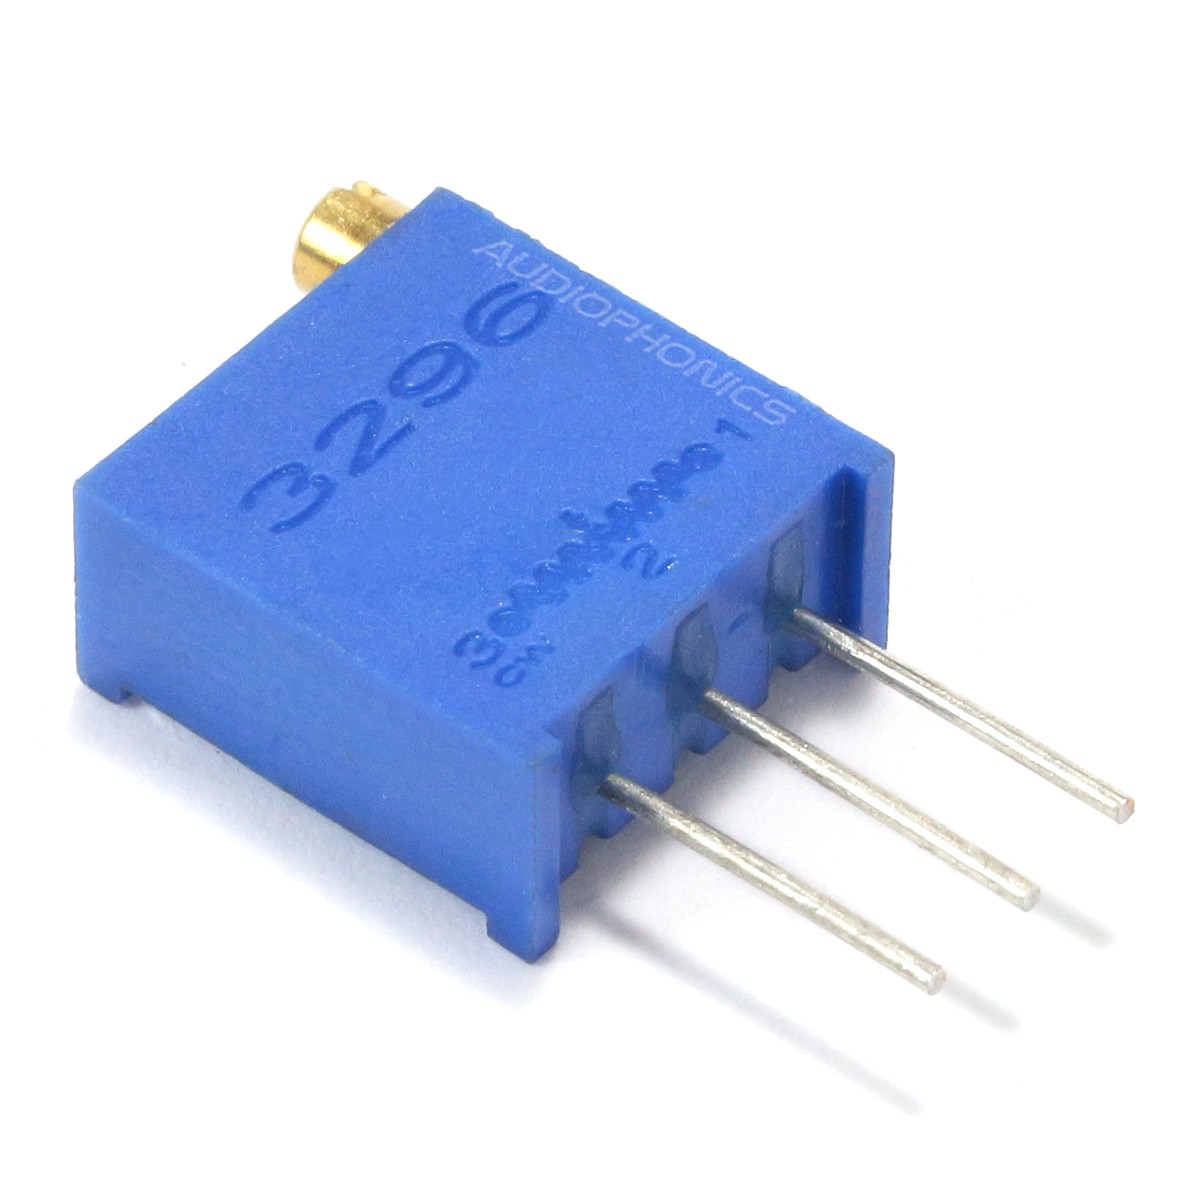 3296W-1-104 Multiturn Trimming Potentiometer 100K Ohm